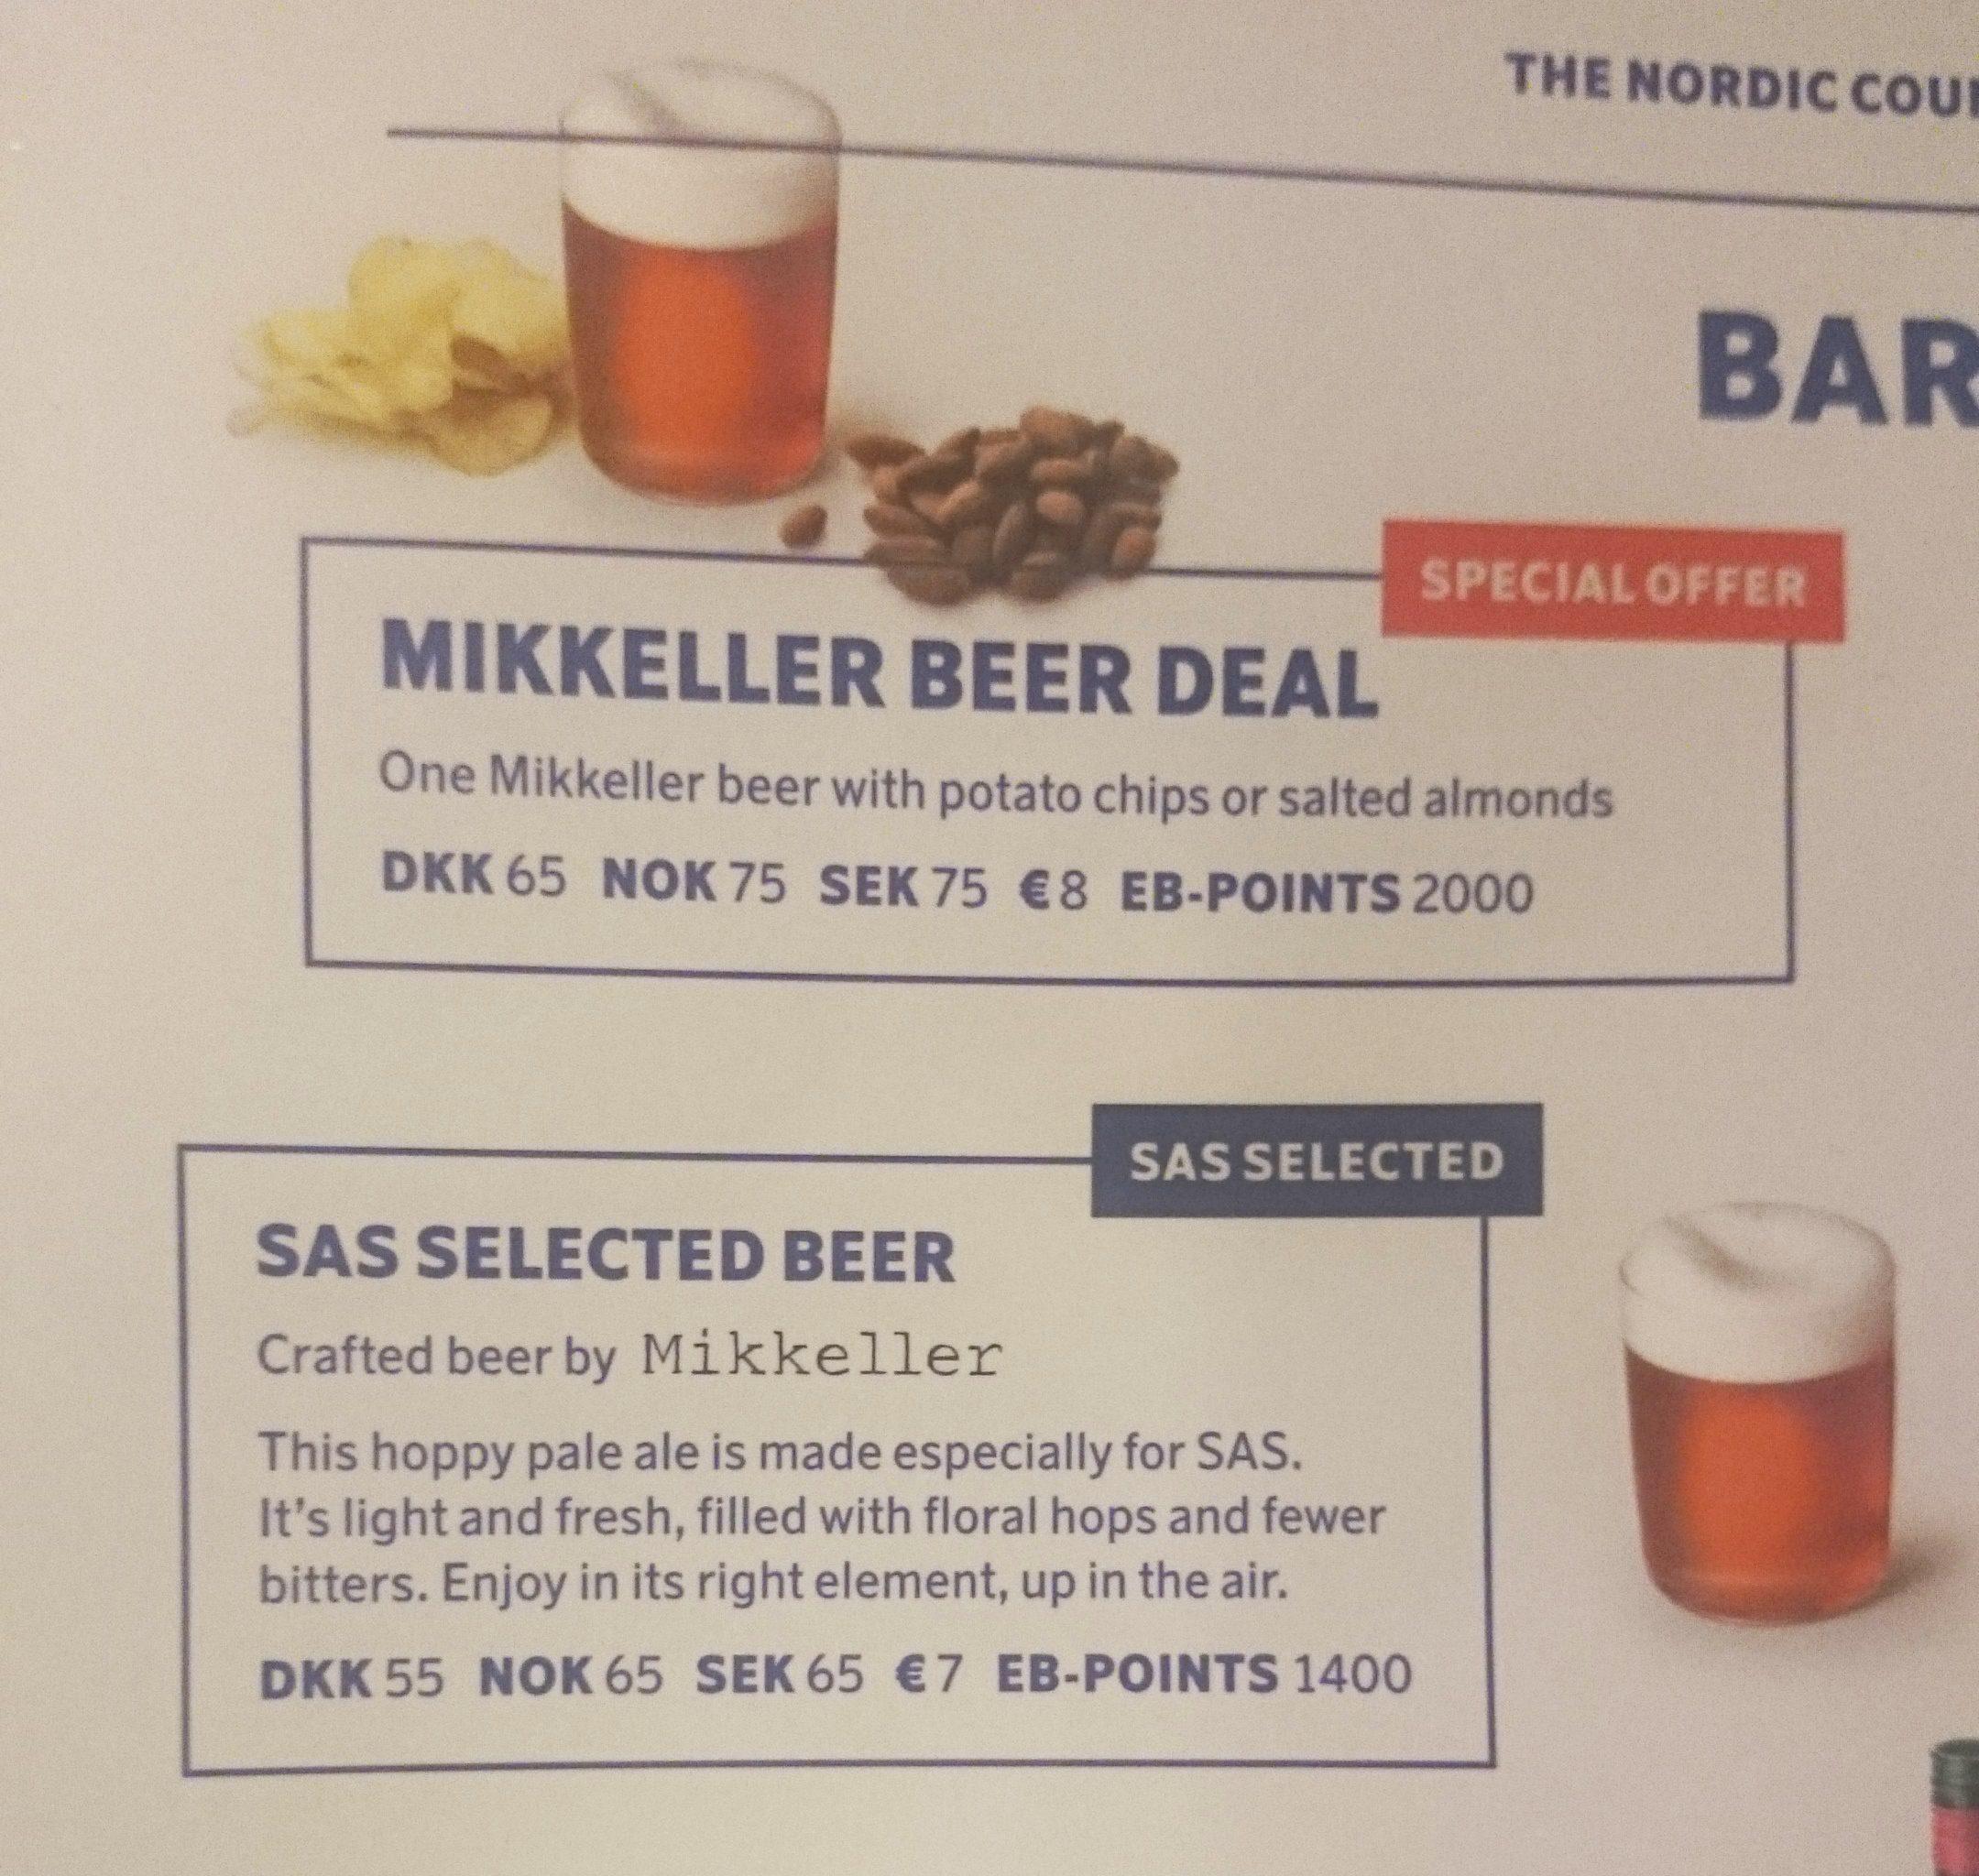 Craft beer in Bergen, Norway | The Ale in Kaleigh